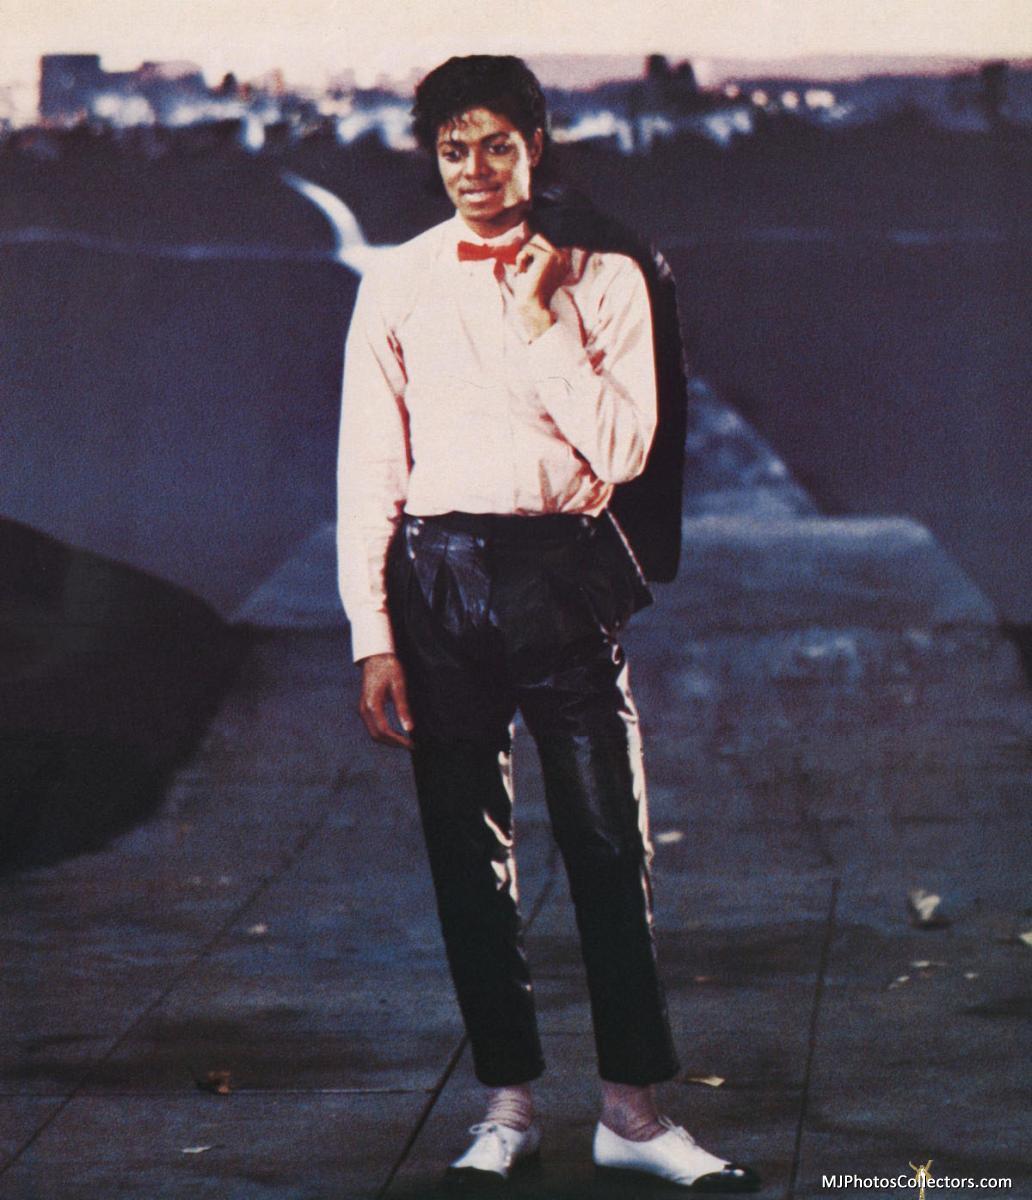 Remembering Michael Jackson